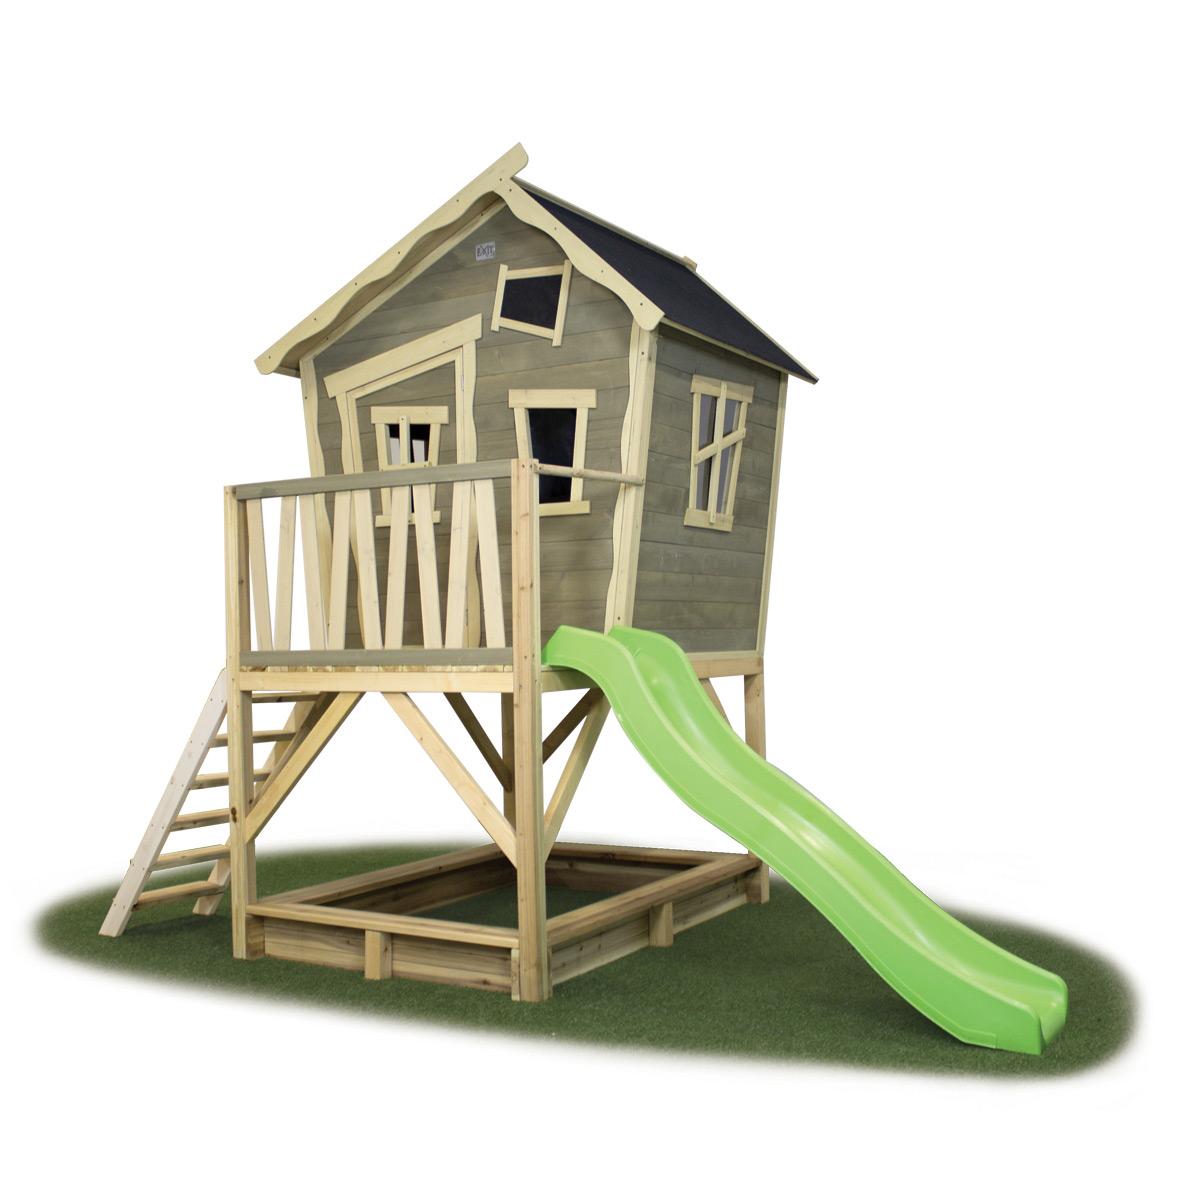 Kinder Spielhaus Exit Crooky 500 Kinderspielhaus Holz Stelzenhaus